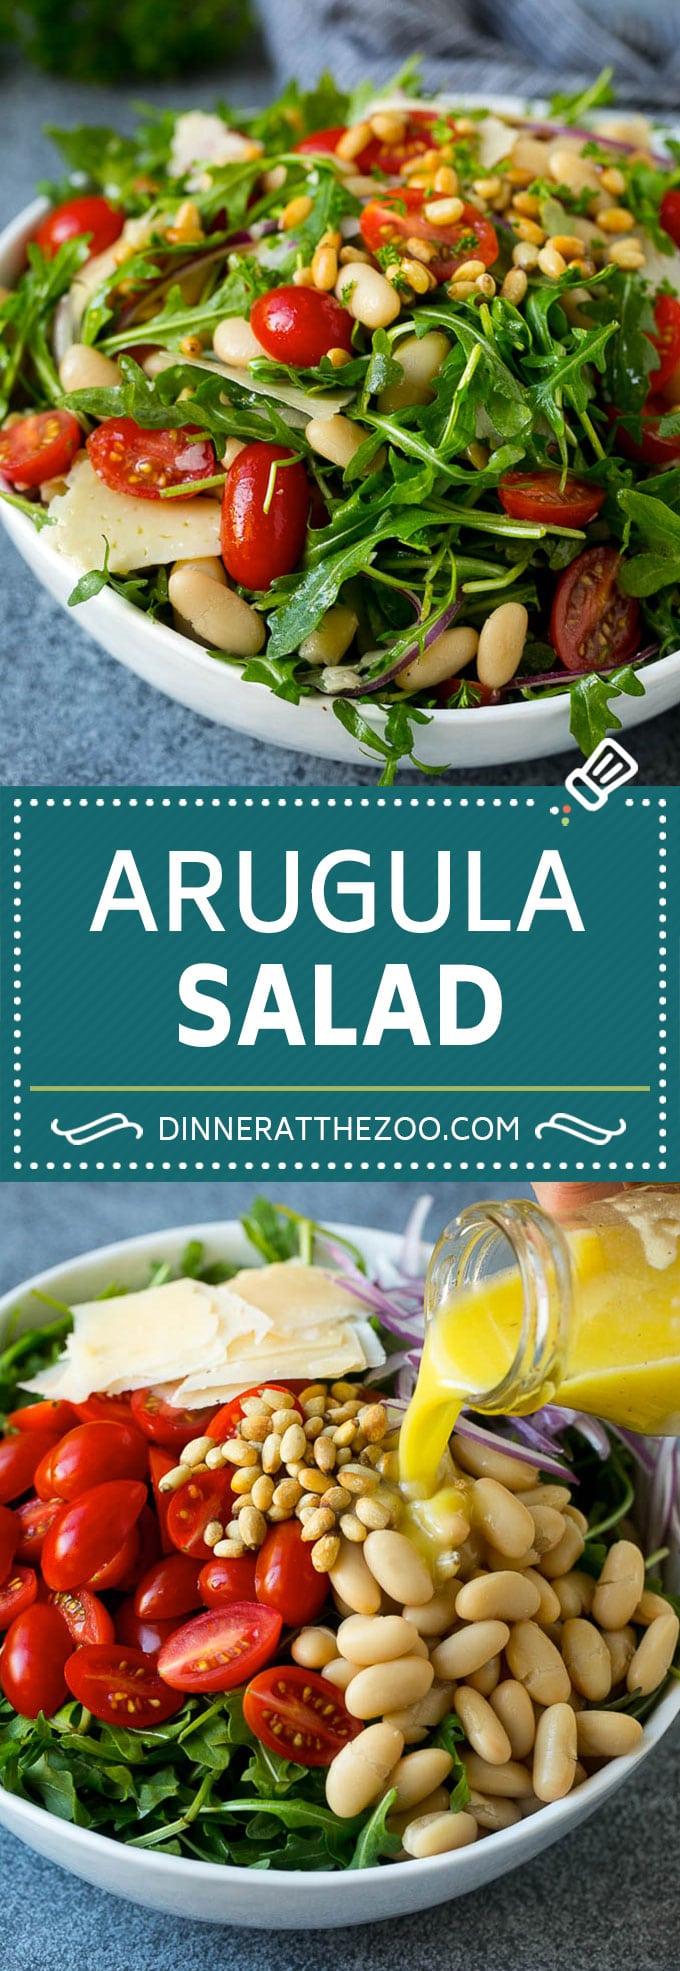 Arugula Salad Recipe | Green Salad | White Bean Salad